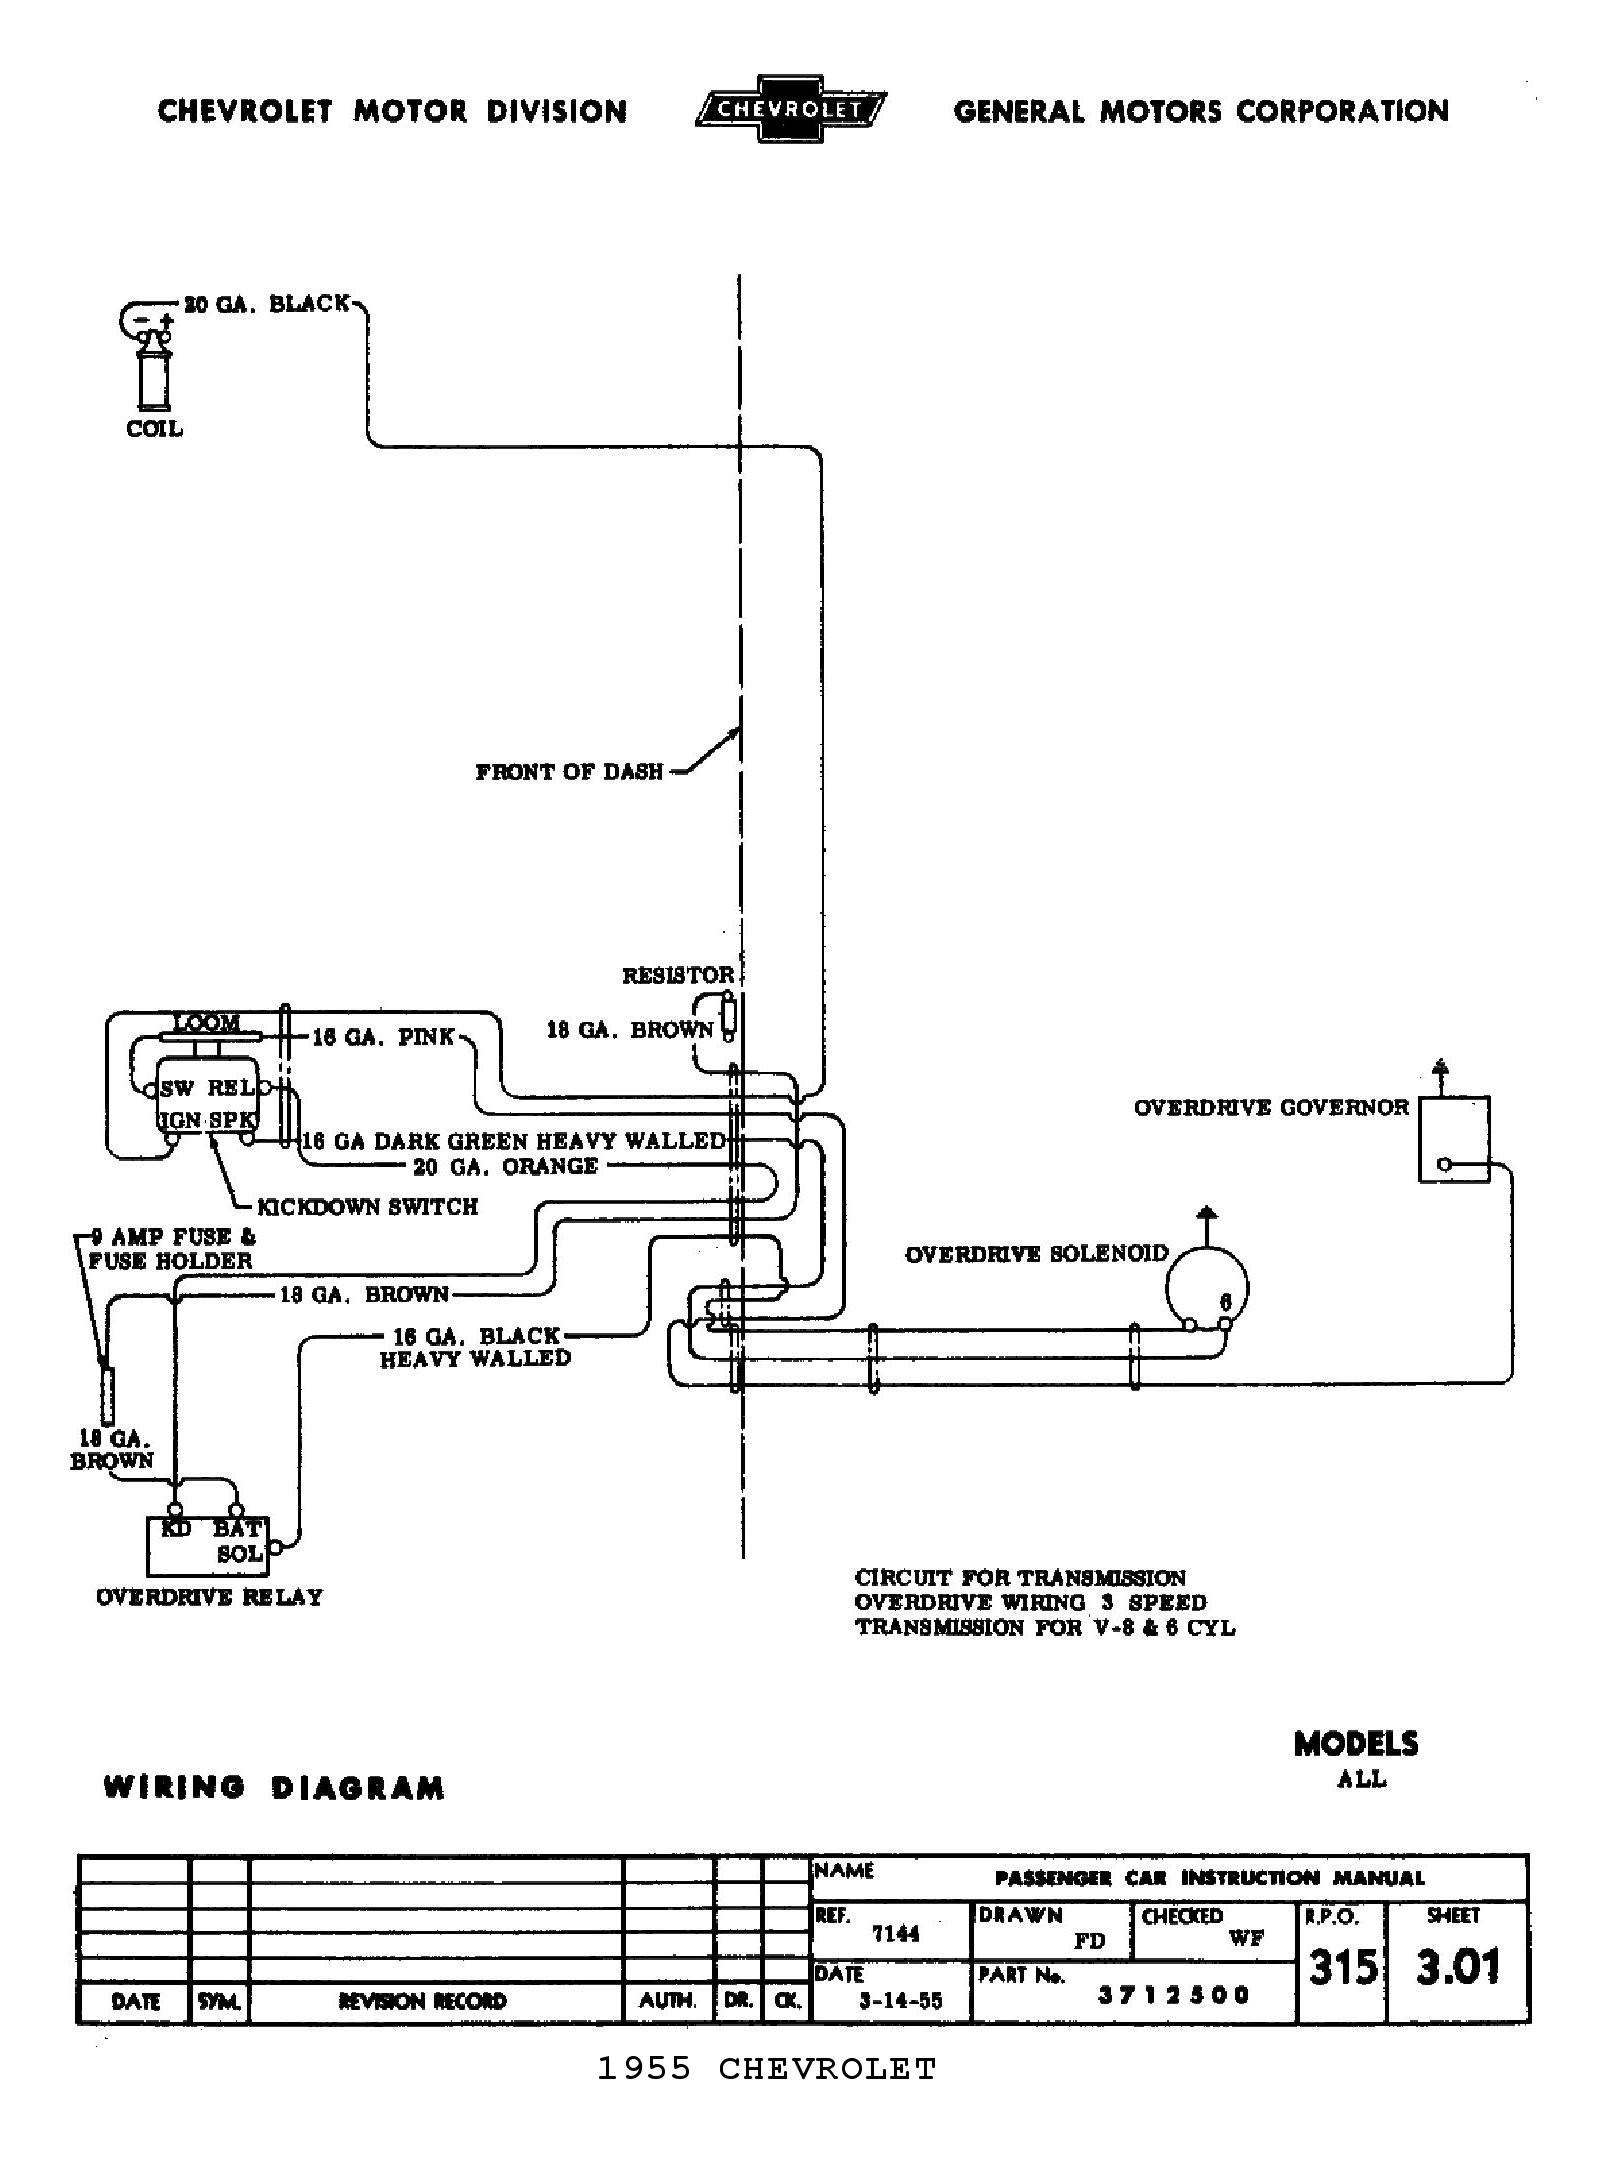 Chevrolet Truck Wiring Diagrams 55 Chev Wiring Diagram Wiring Diagram for You Of Chevrolet Truck Wiring Diagrams